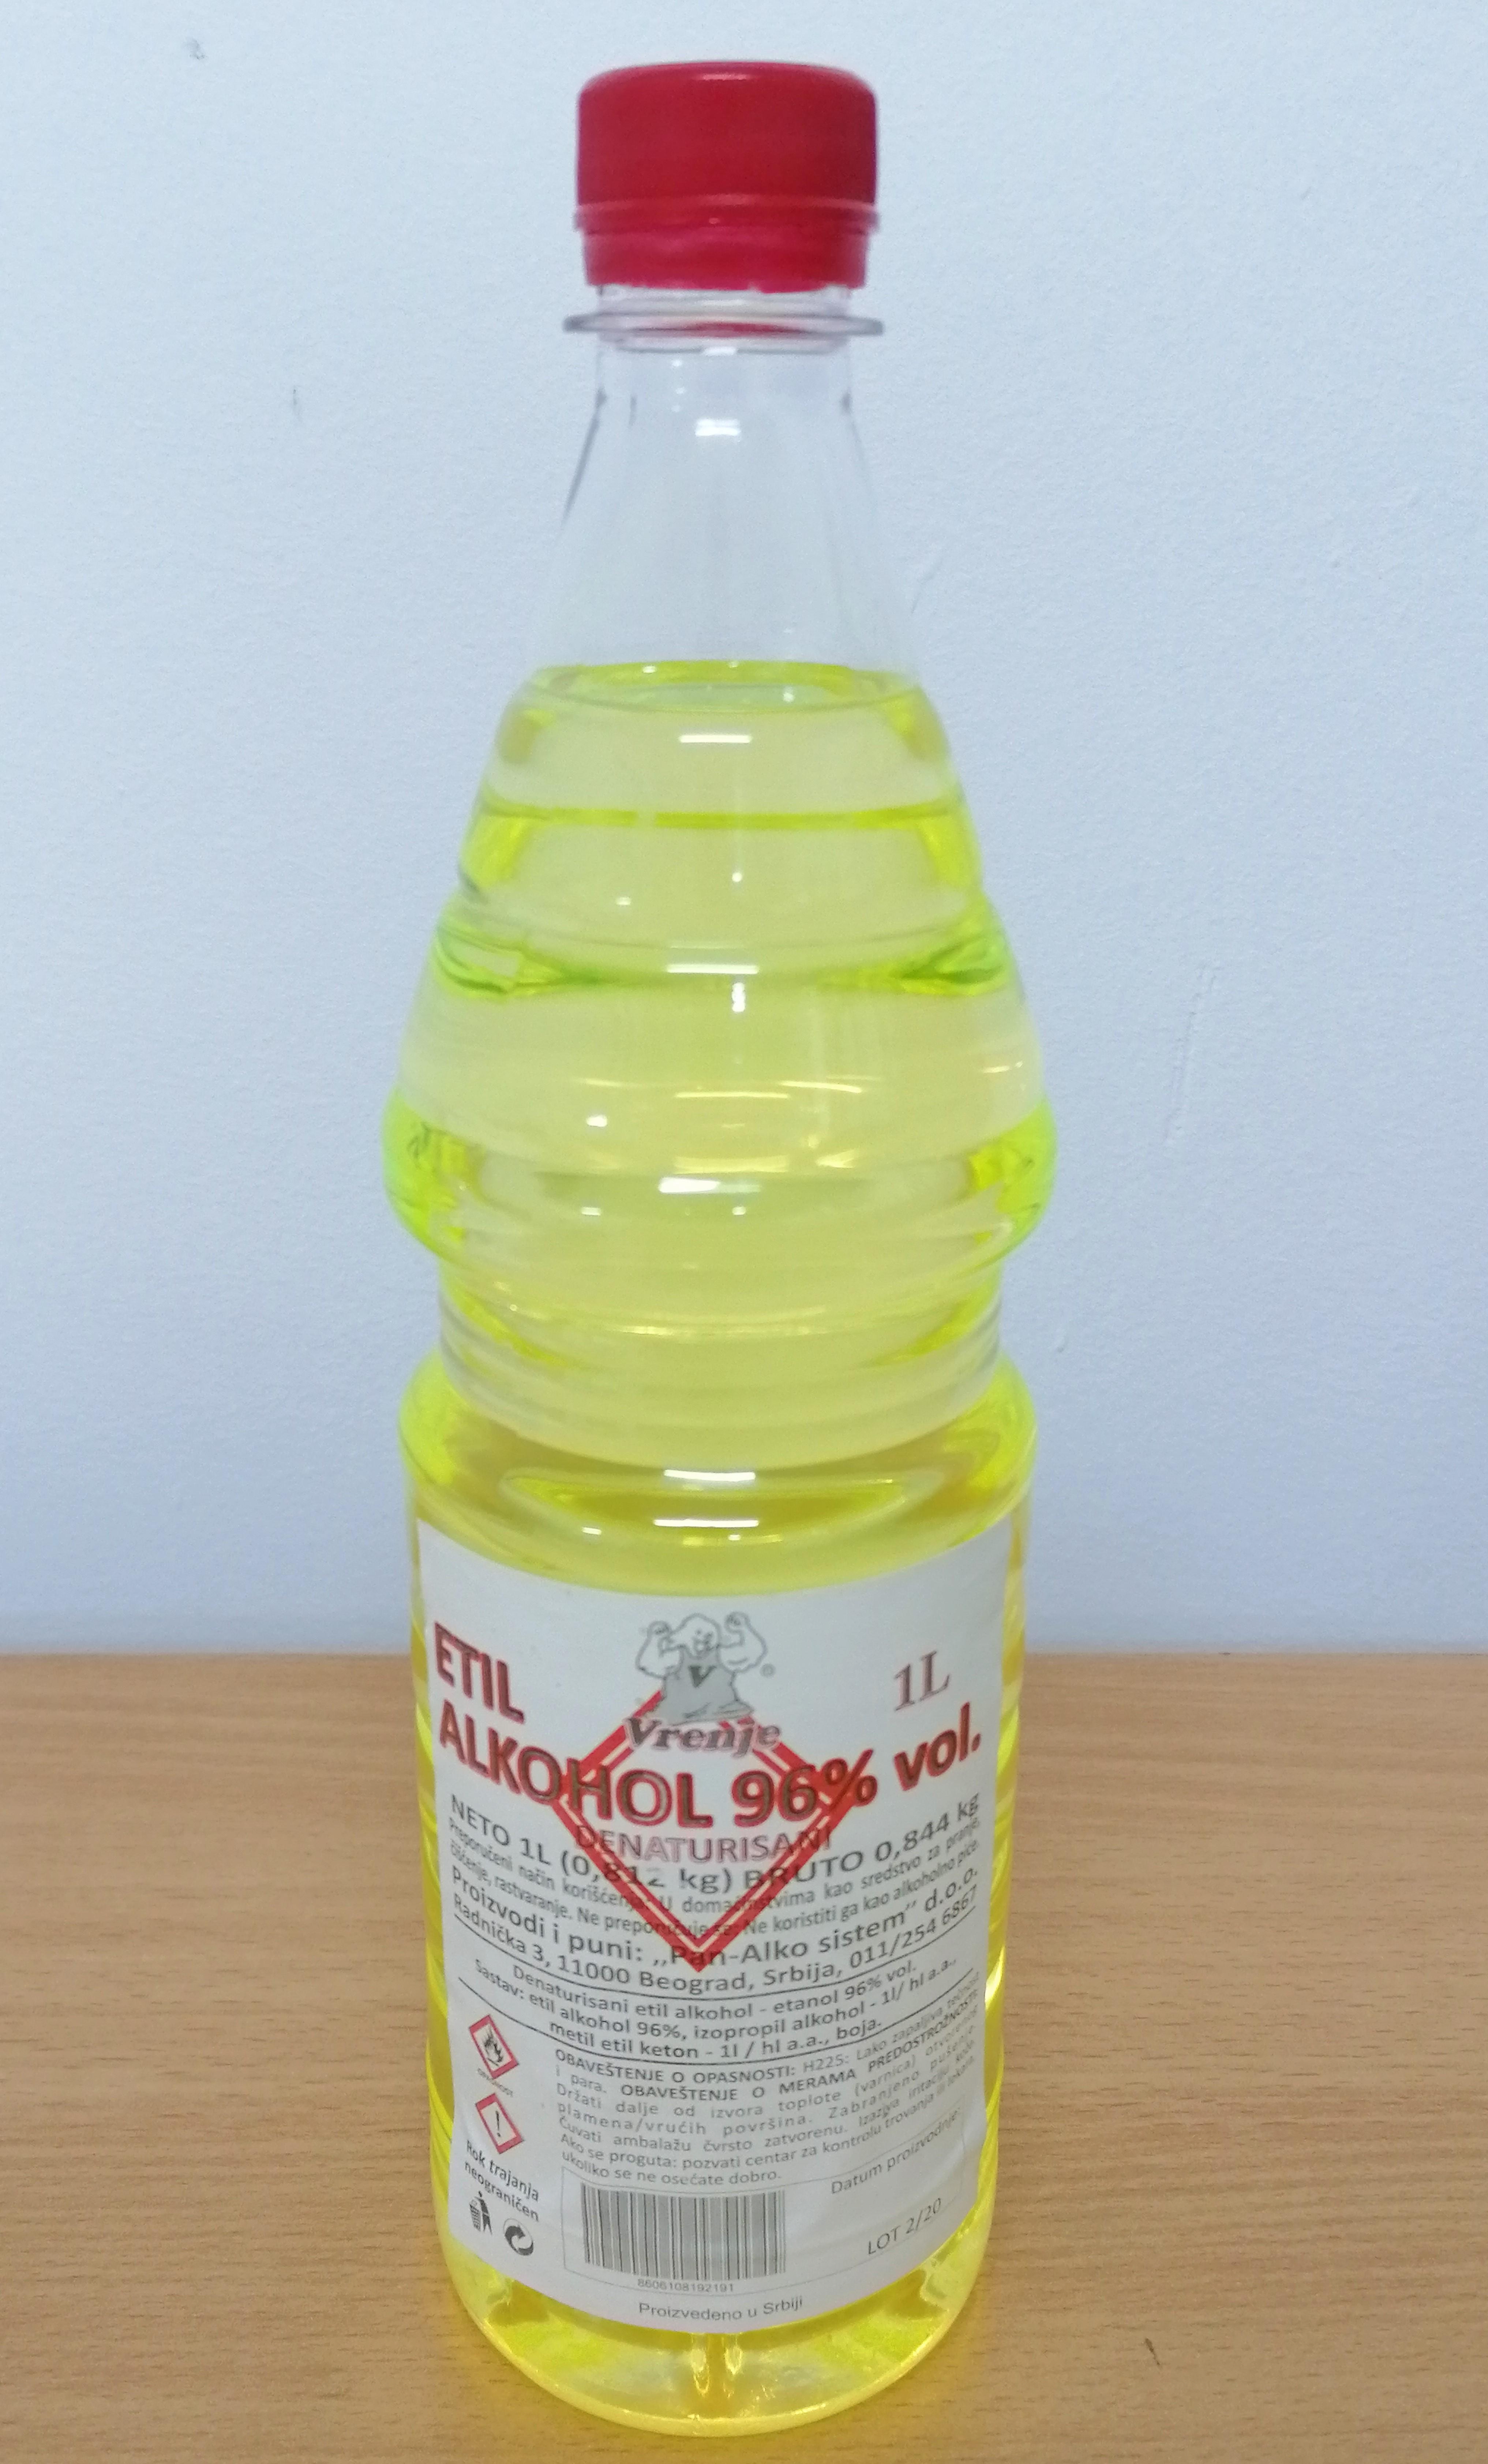 denaturisani-alkohol-1l-pan-alko-sistem